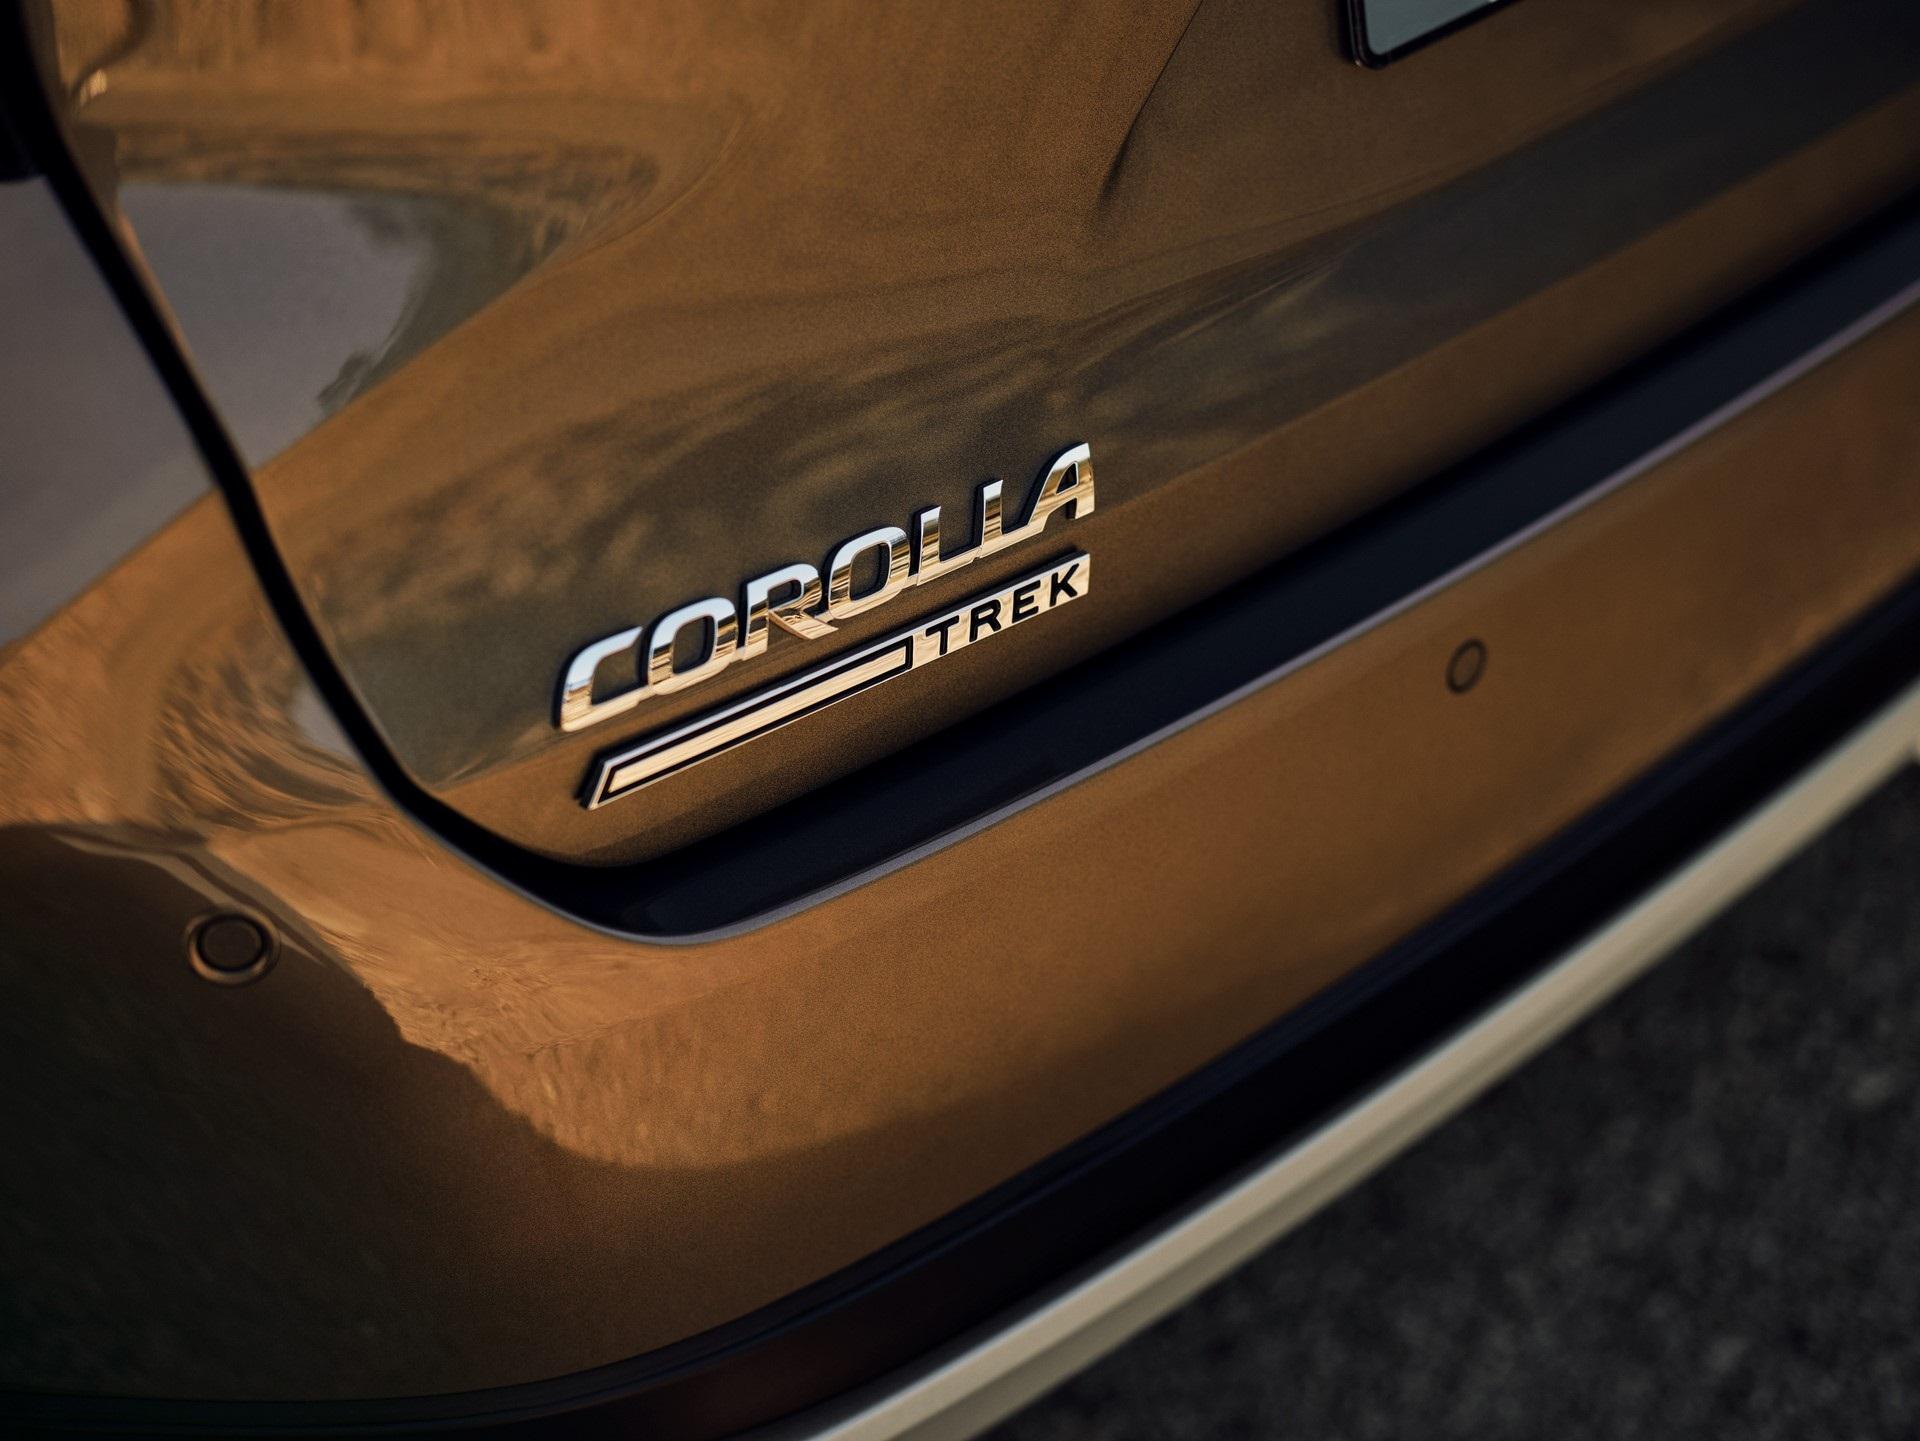 Toyota Corolla Trek (4)